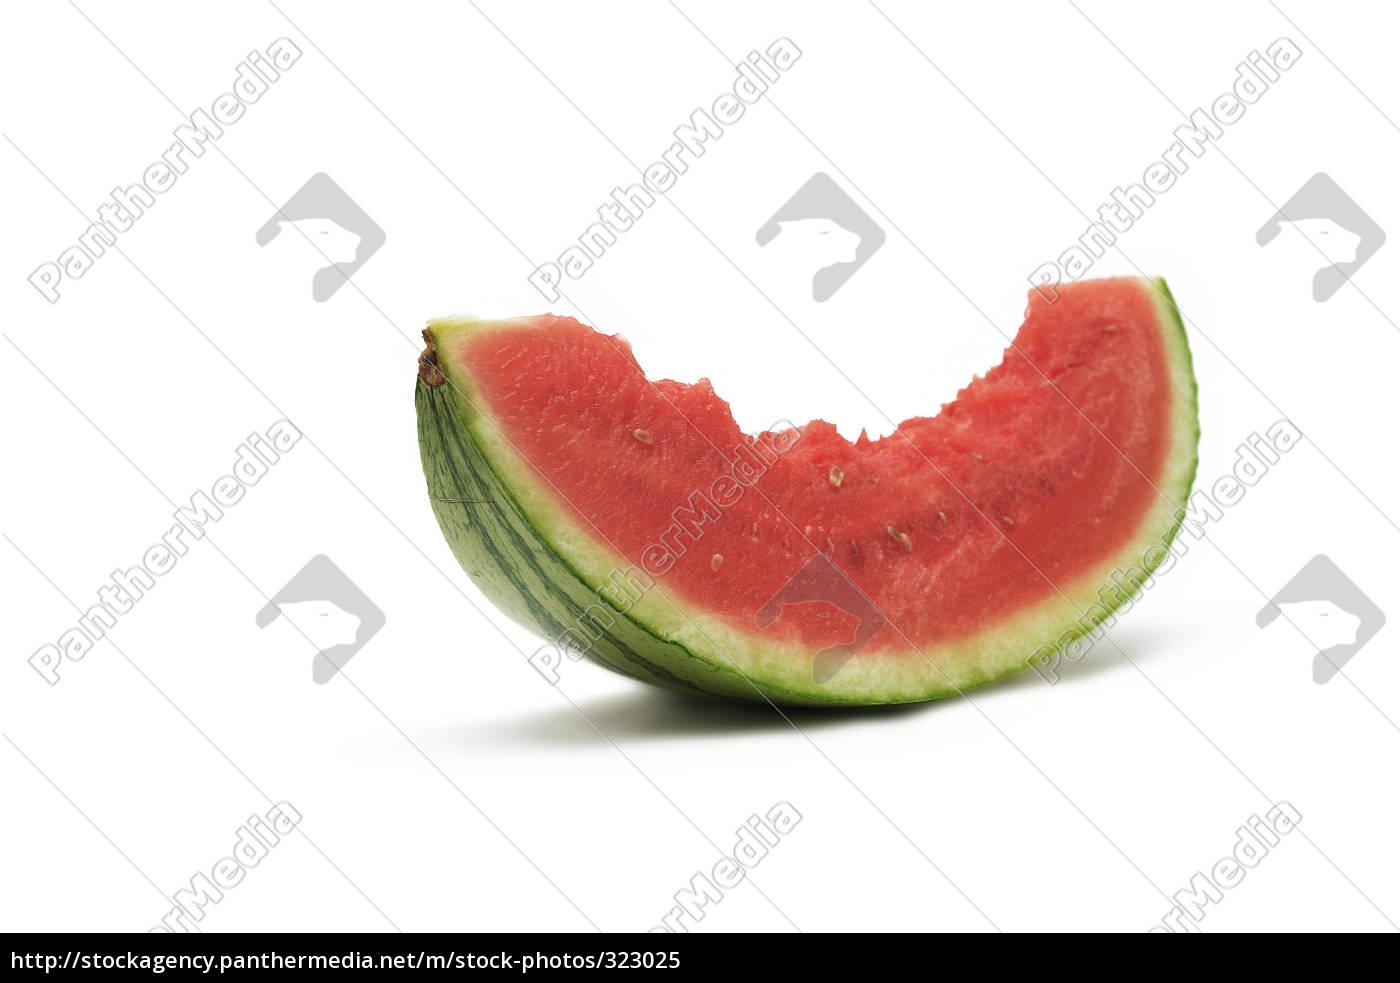 melon - 323025